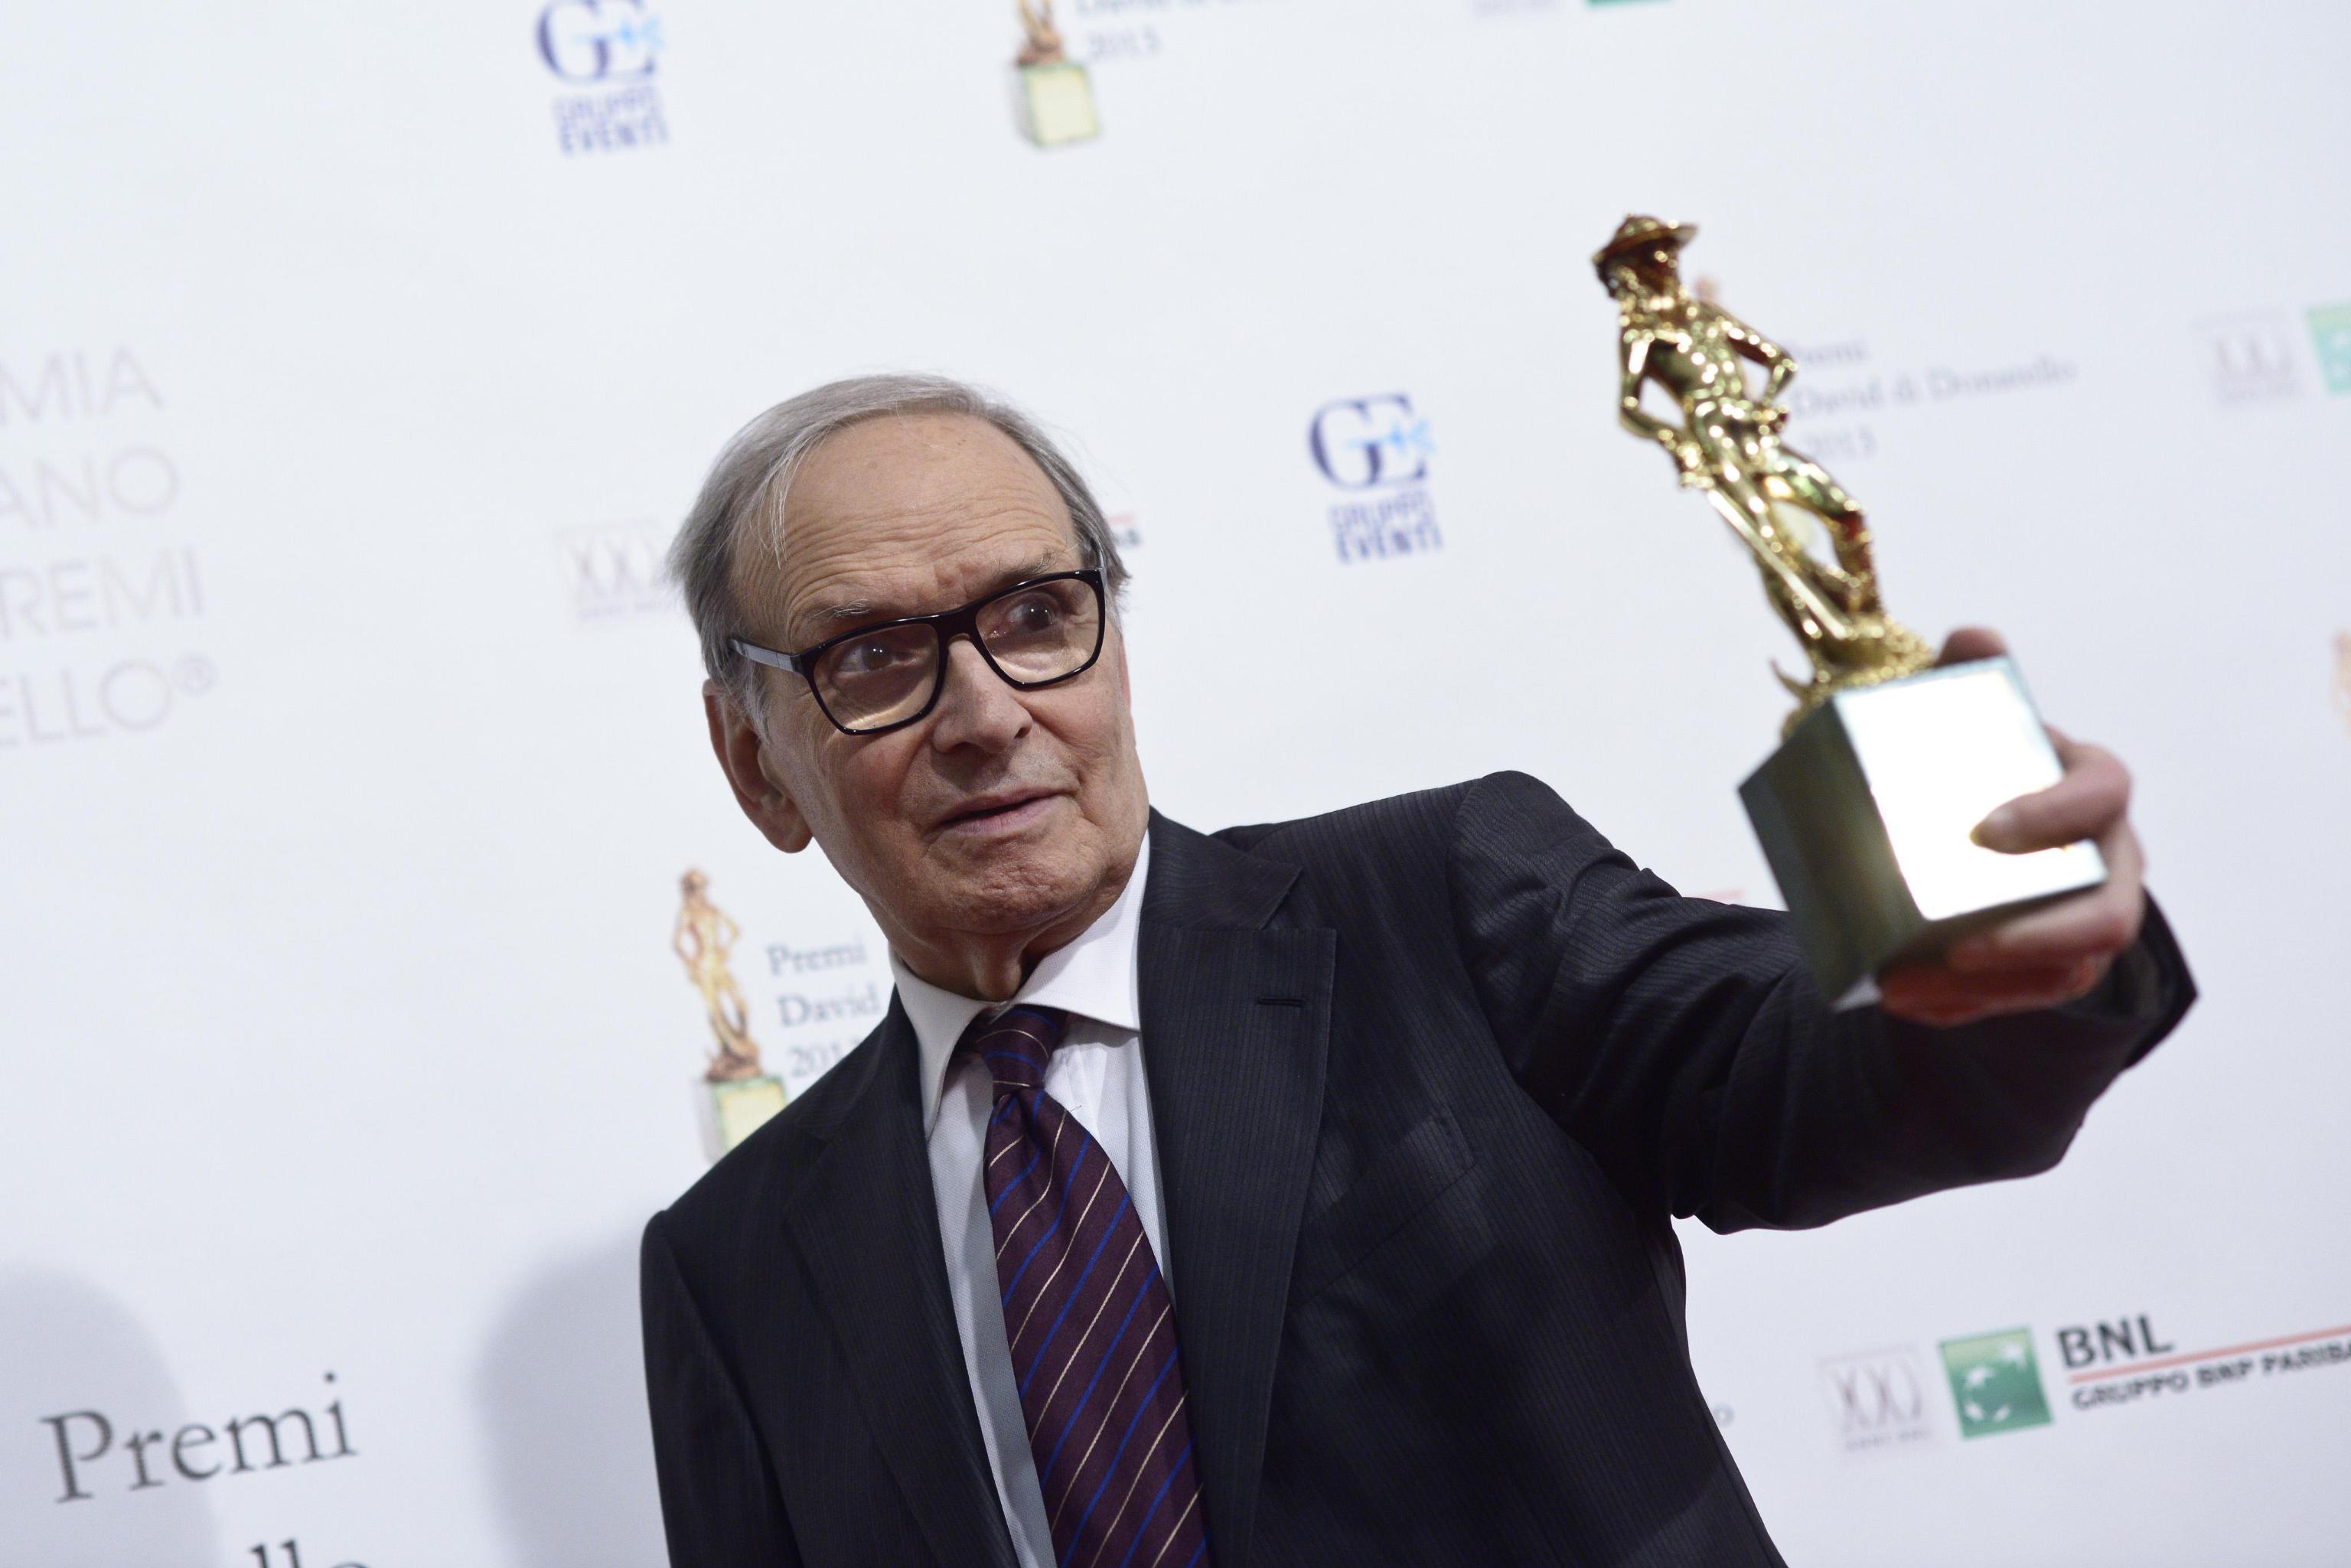 Golden Globe a Ennio Morricone. Tarantino